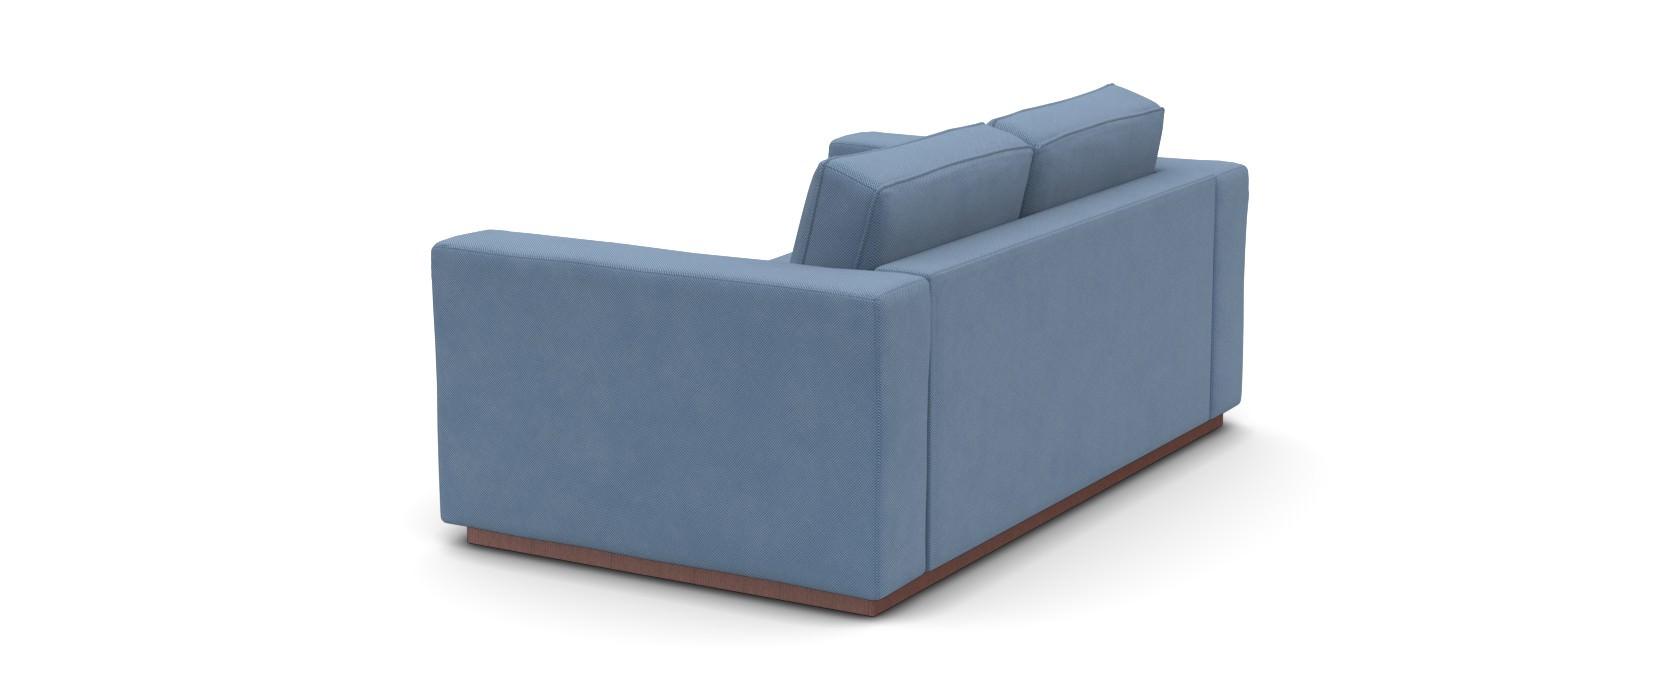 2-Sitzer Sofa Milano